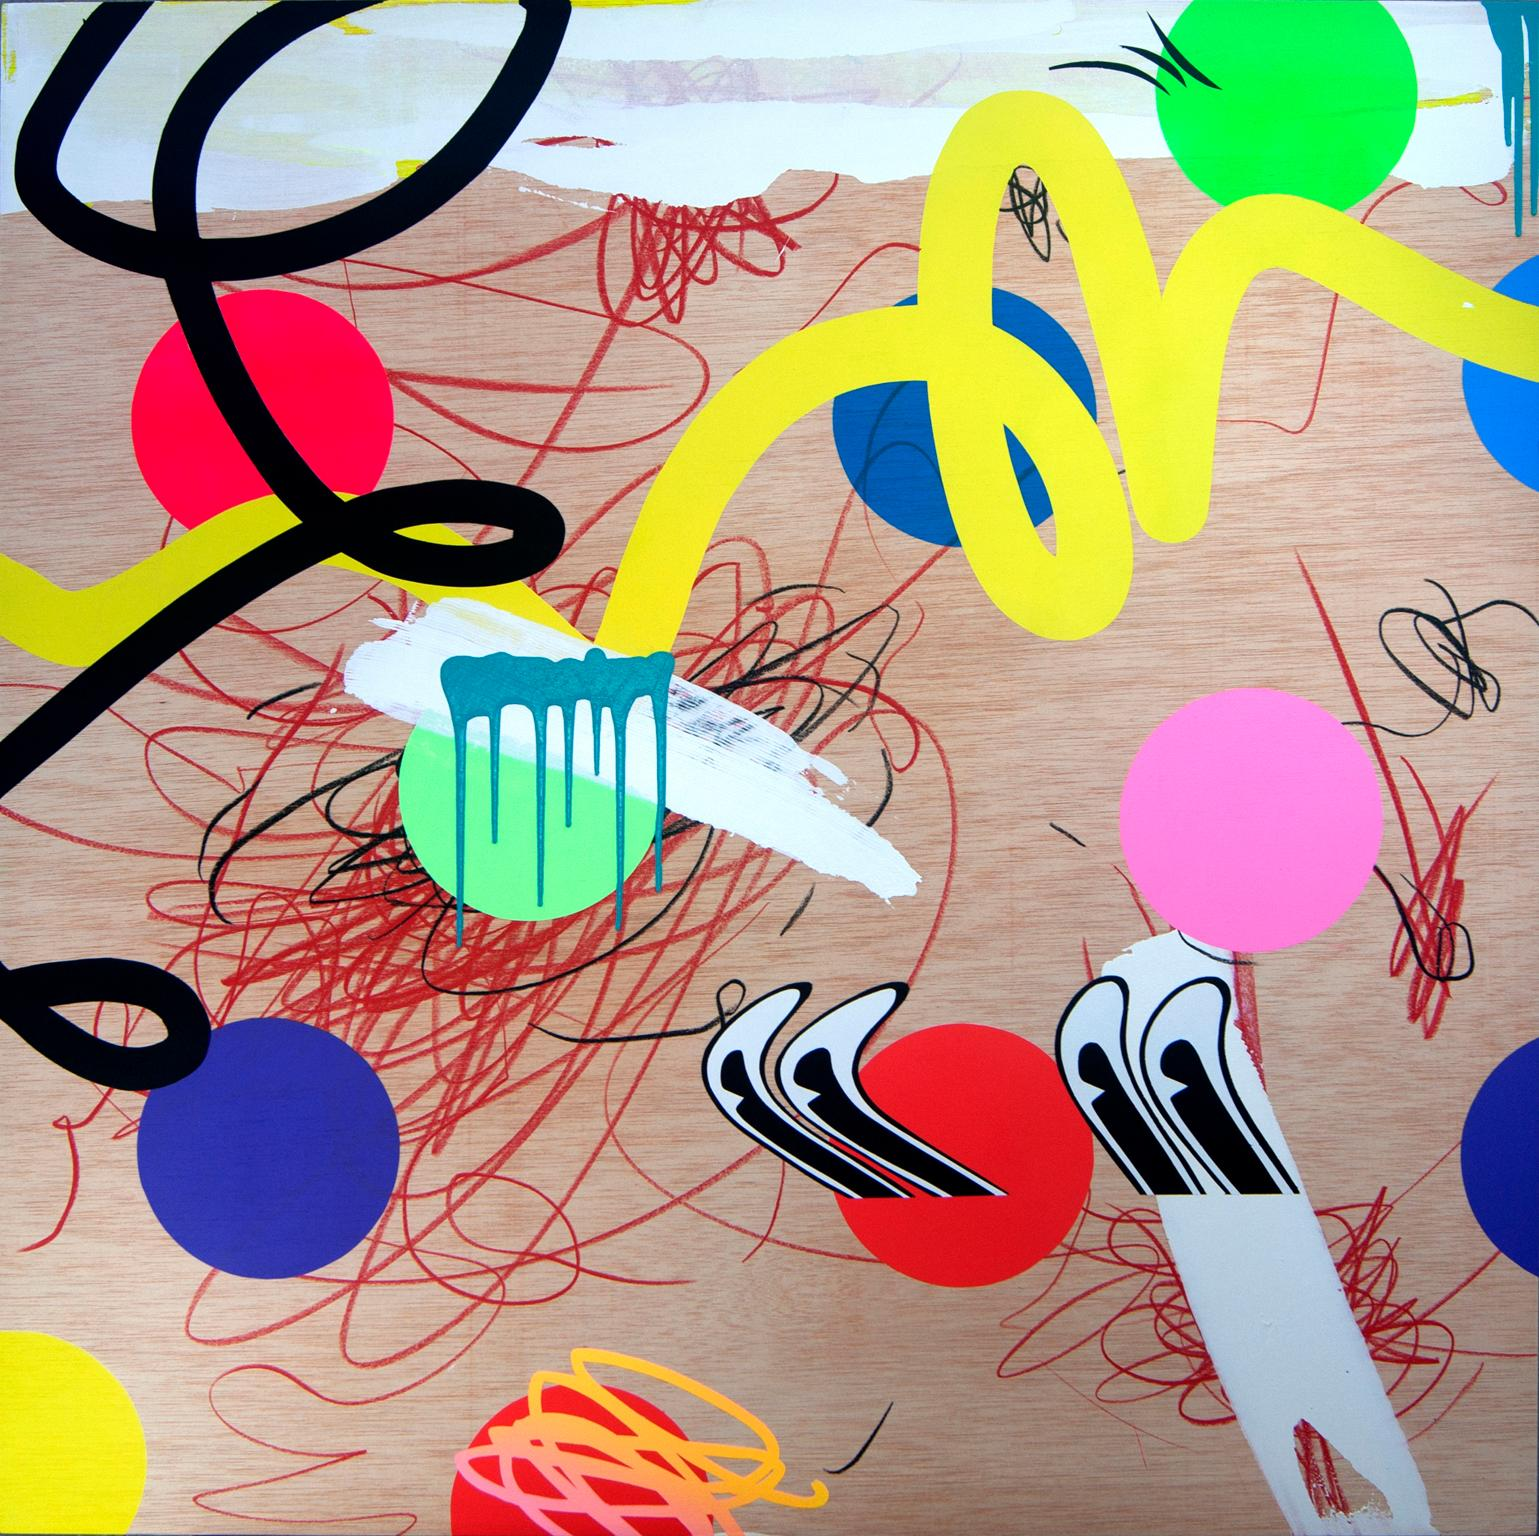 """Centinela"", Acrylic on Wood Panel by Contemporary Artist,  José Palacios, 2019"